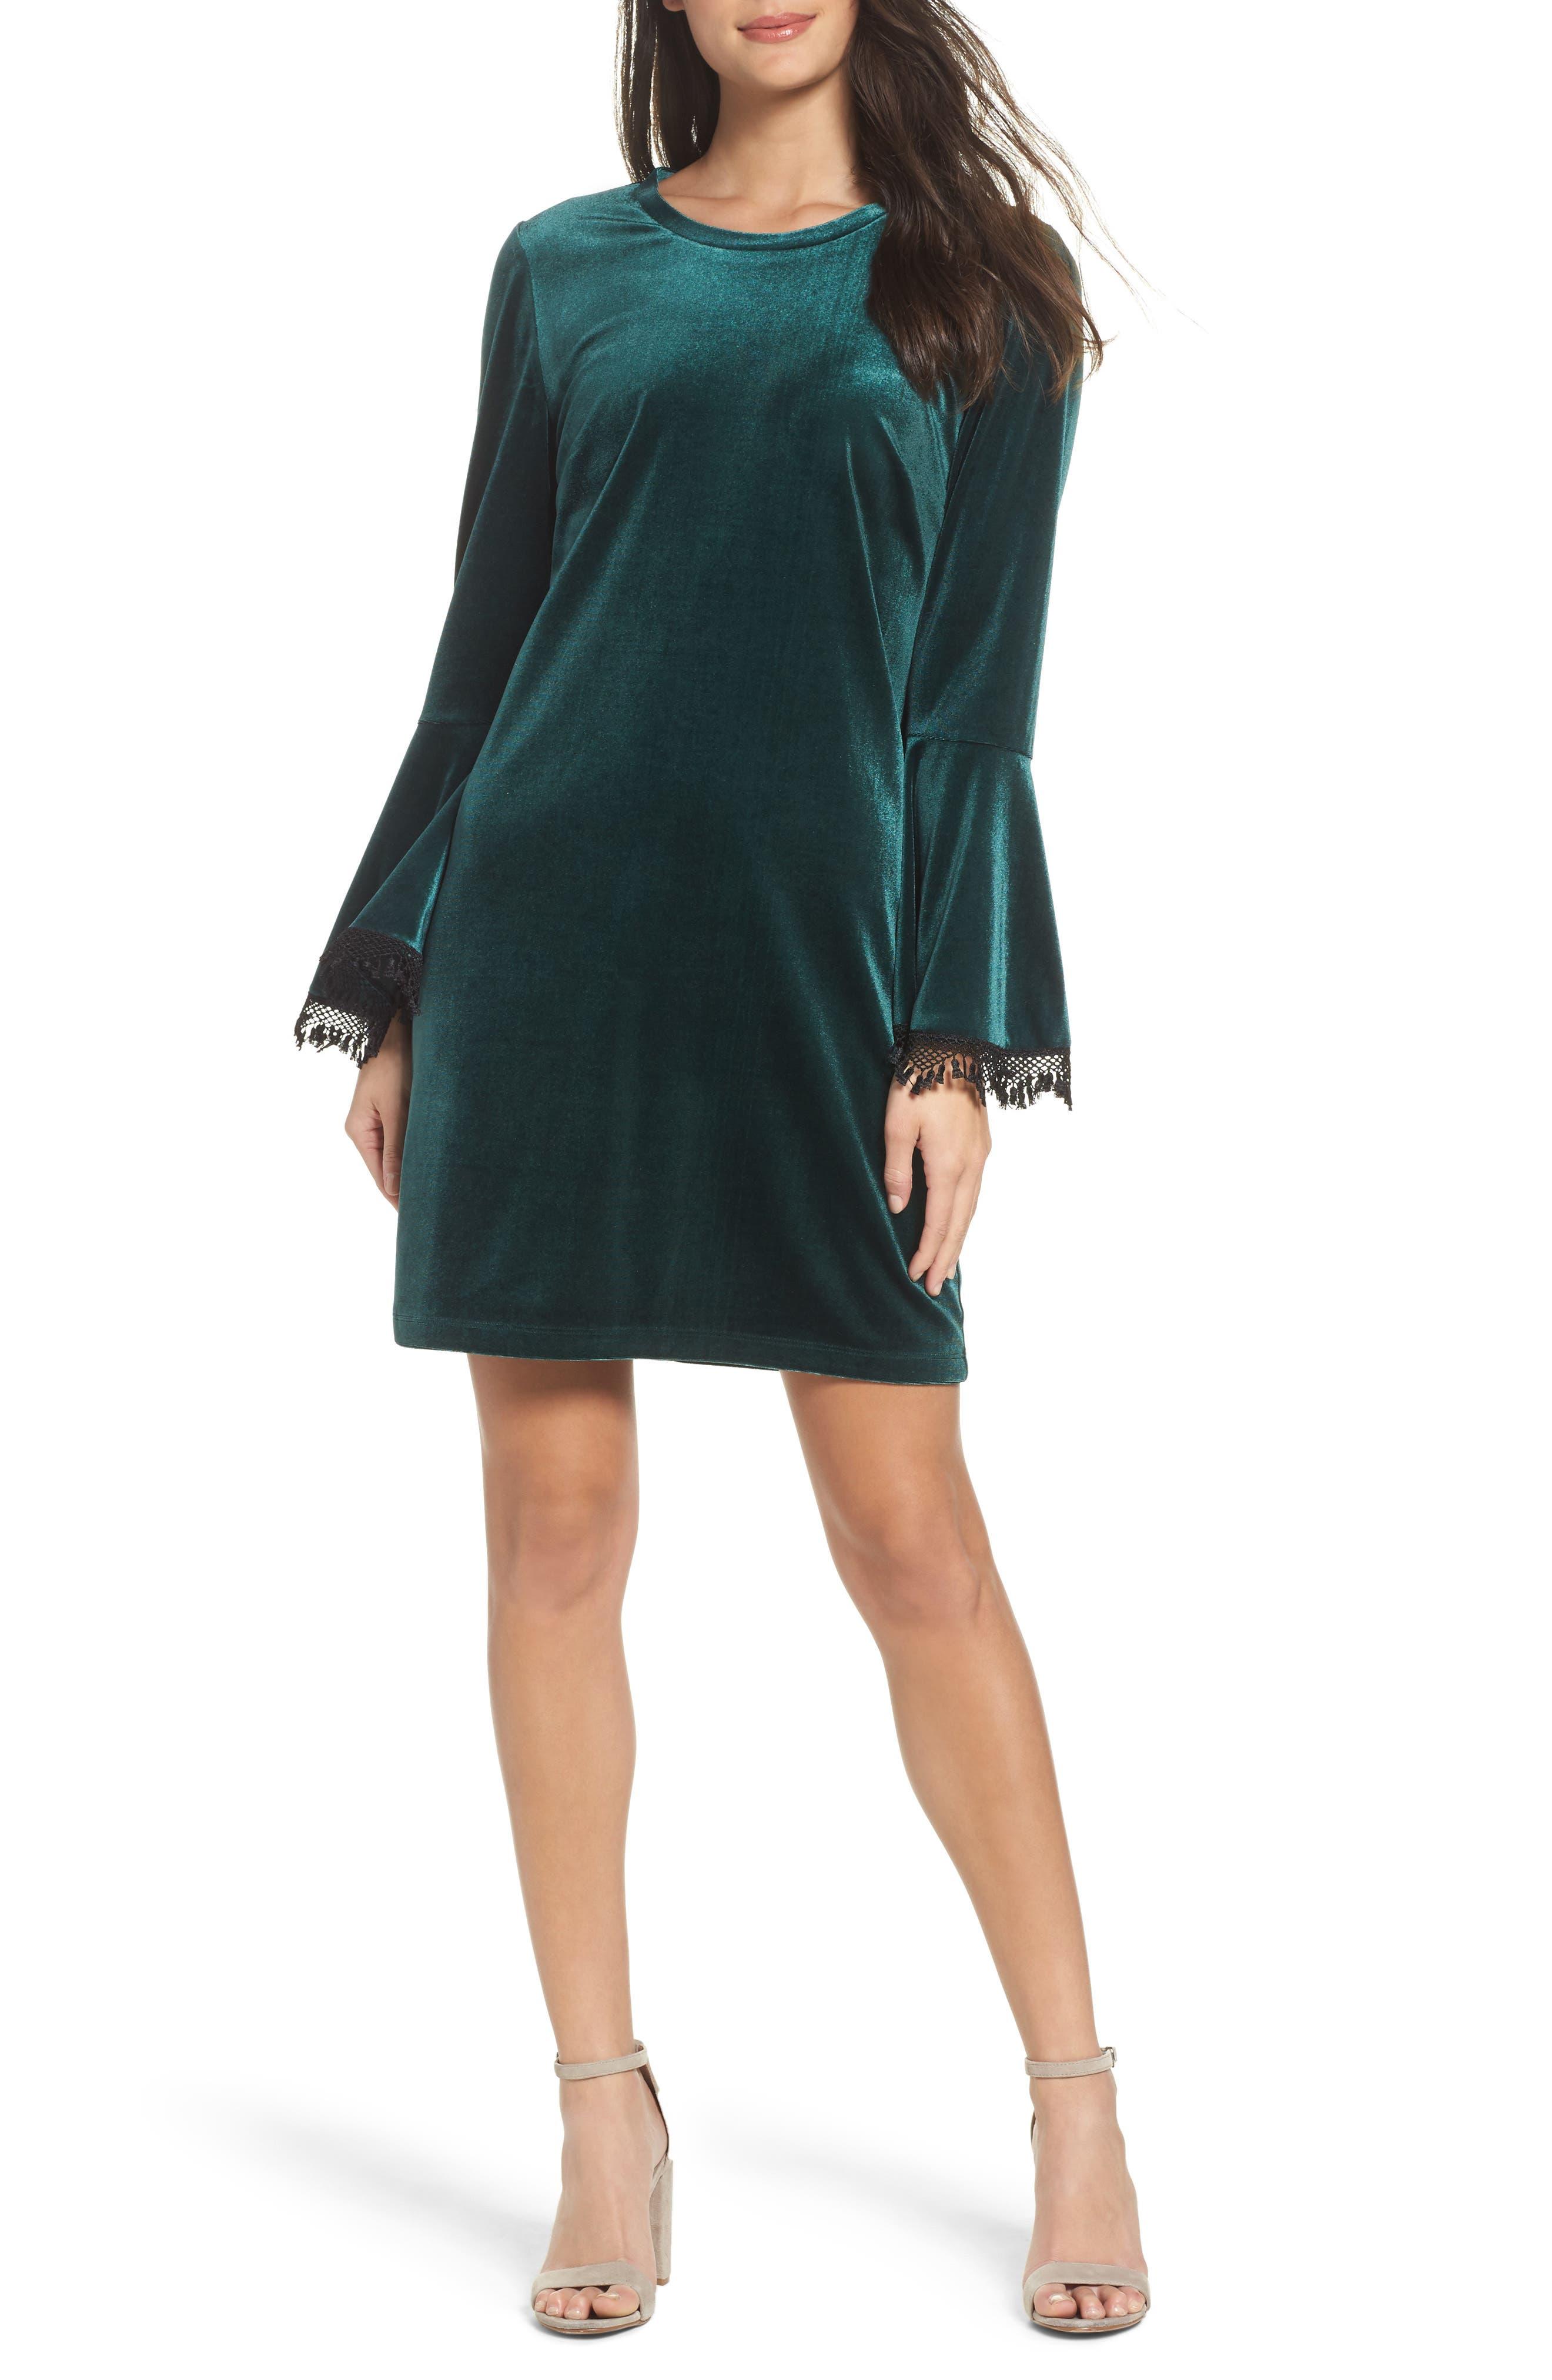 Main Image - Kobi Halperin Hallie Bell Sleeve Velvet Dress (Nordstrom Exclusive)